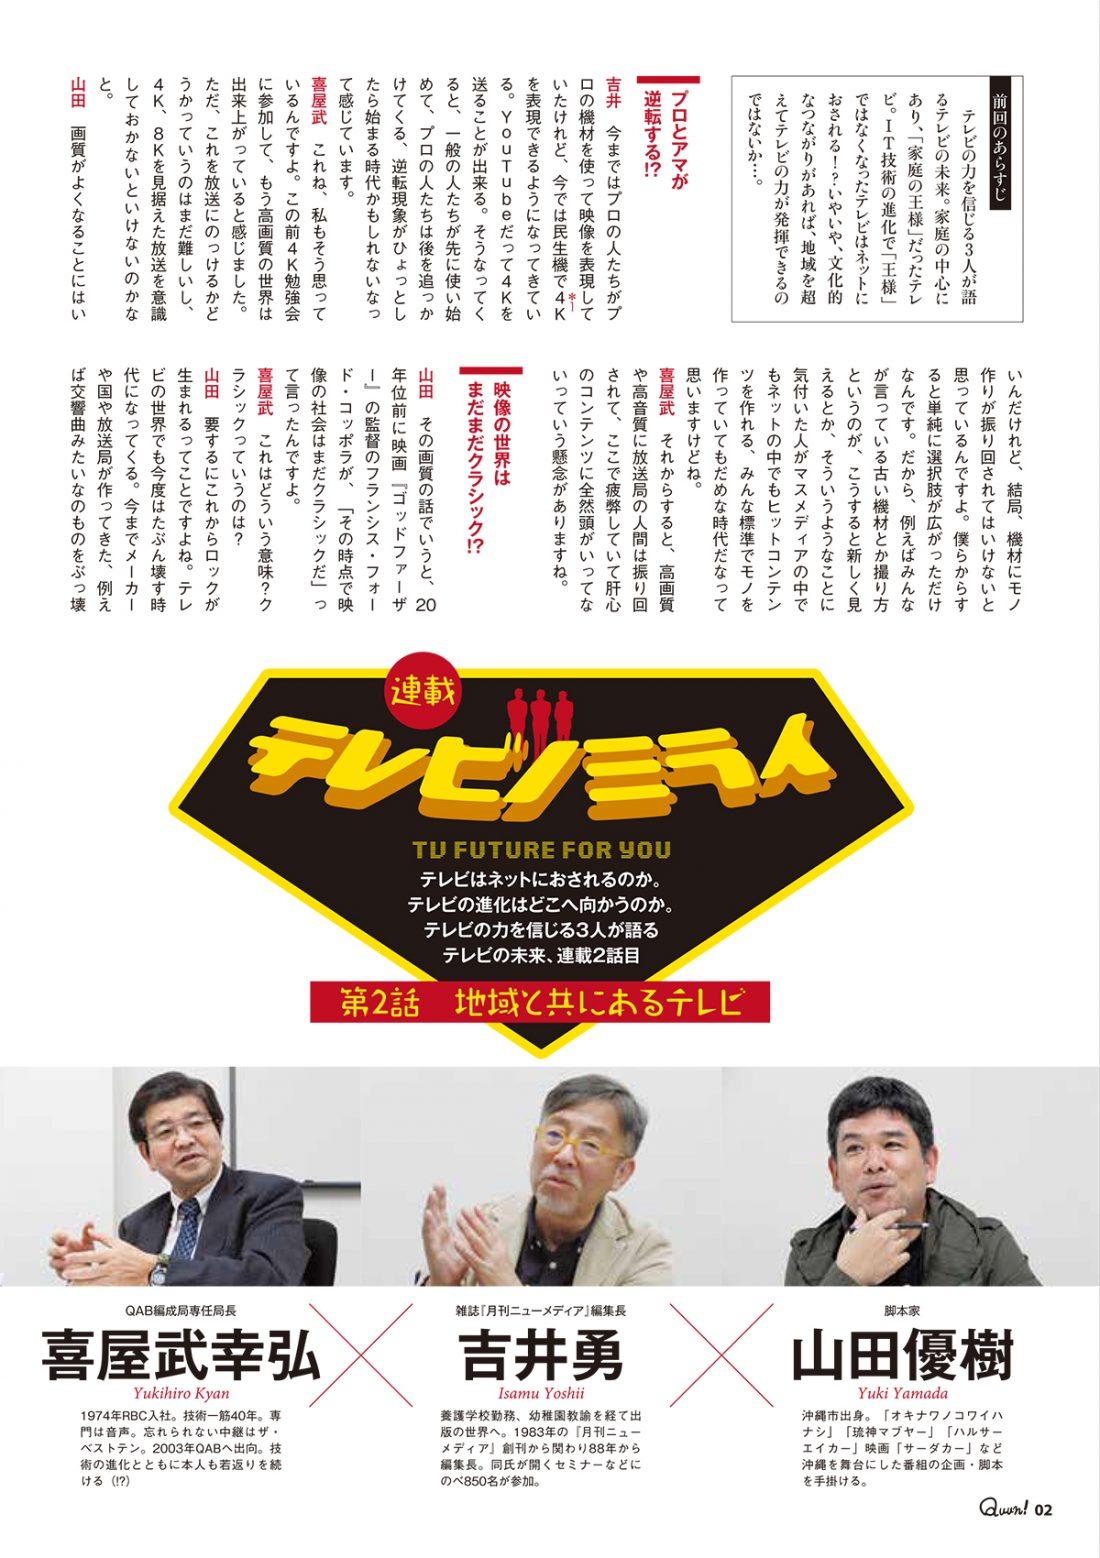 http://www.qab.co.jp/qgoro/wp-content/uploads/quun_0204-1100x1558.jpg